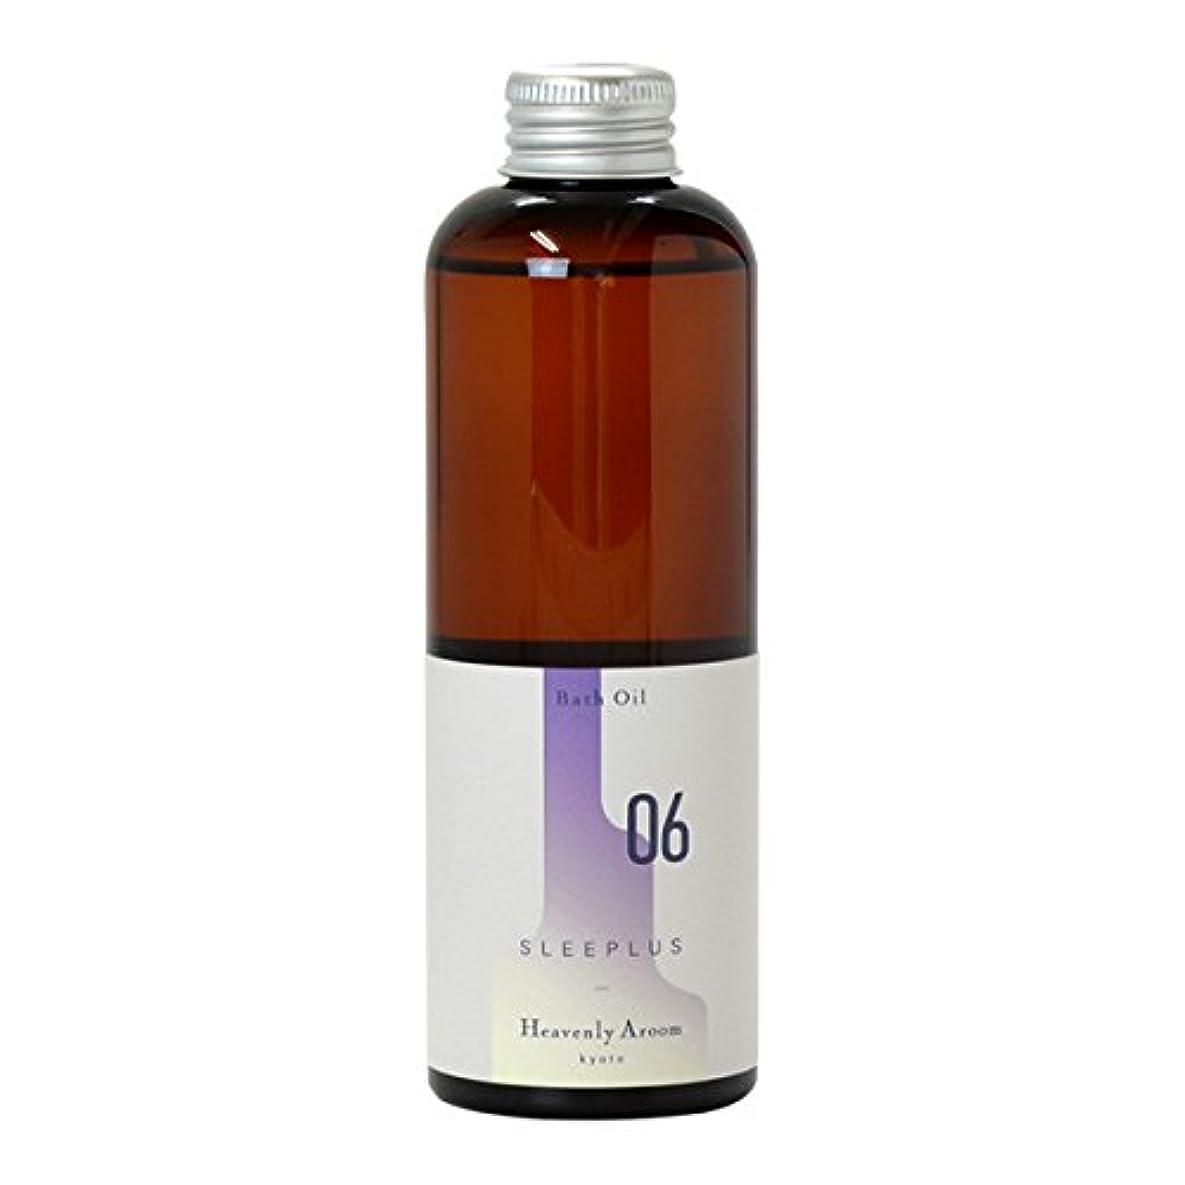 Heavenly Aroom バスオイル SLEEPLUS 06 ラベンダーバニラ 200ml